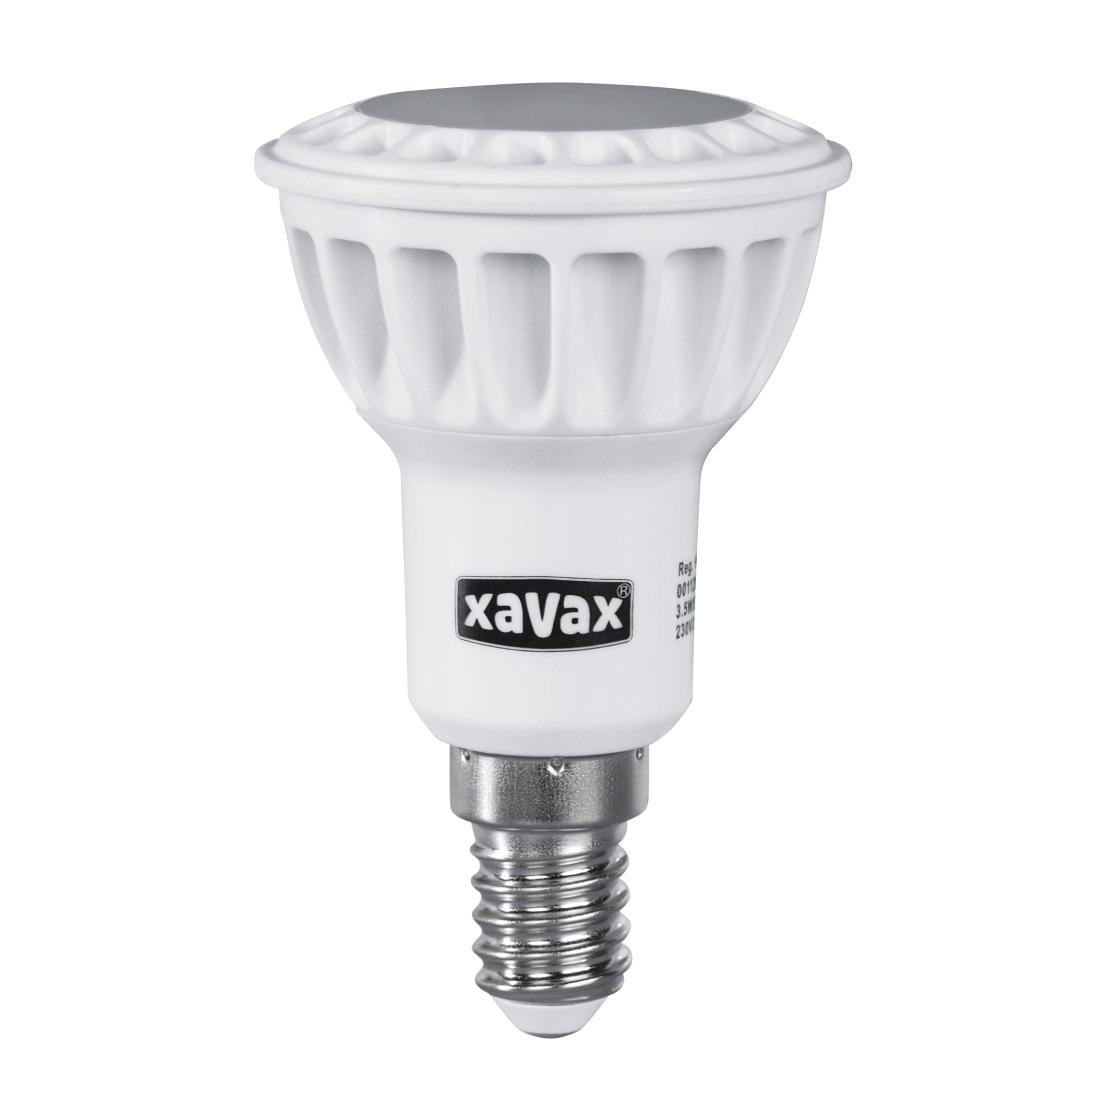 00112089 xavax led lampe e14 200lm ersetzt 25w reflektorlampe r50 warmwei. Black Bedroom Furniture Sets. Home Design Ideas